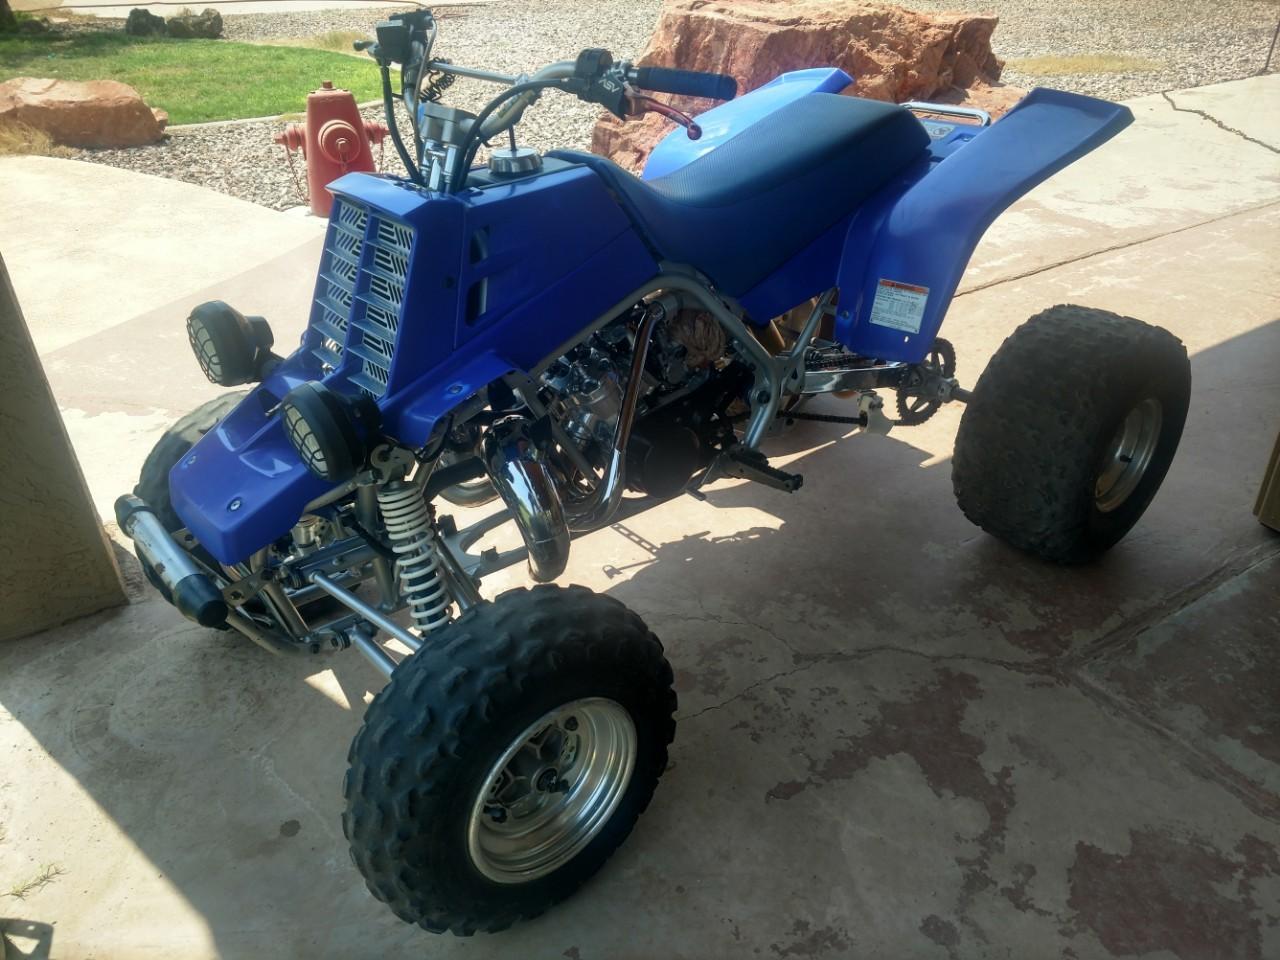 YAMAHA BANSHEE ATV ATVs For Sale: 10 ATVs - ATVTrader com